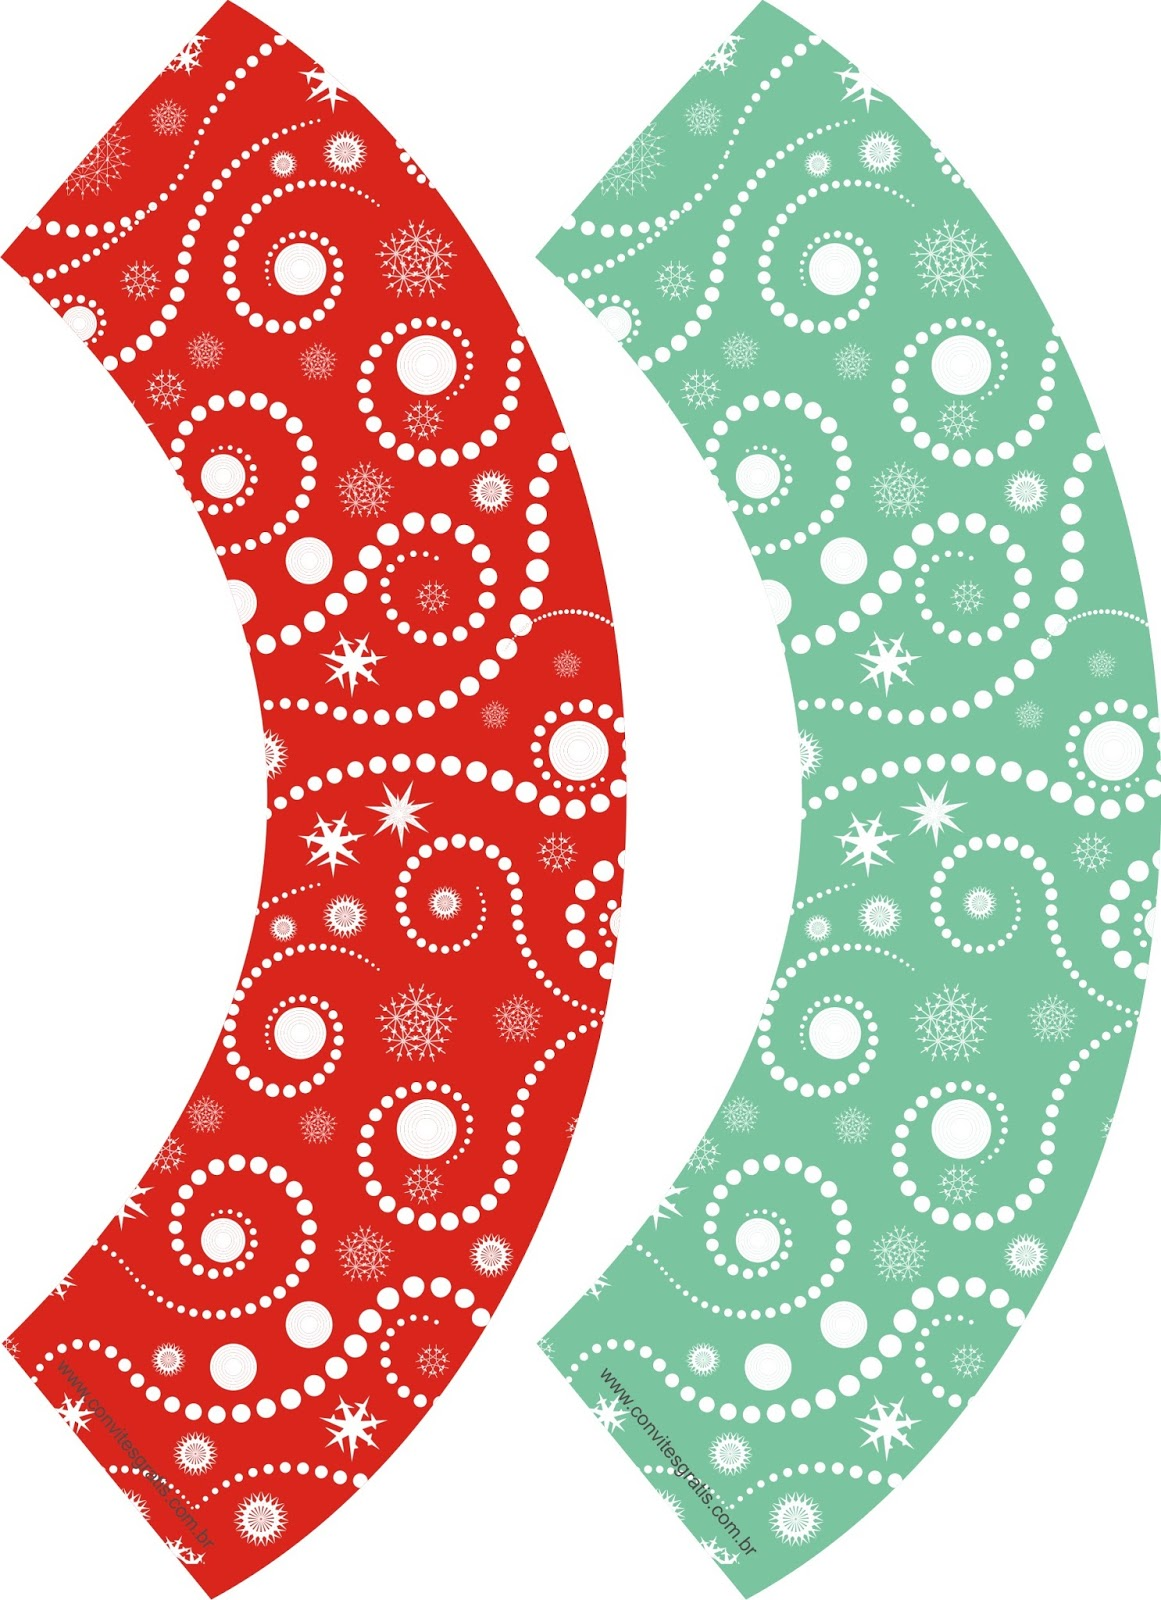 wrappers decoracao de natal gratis